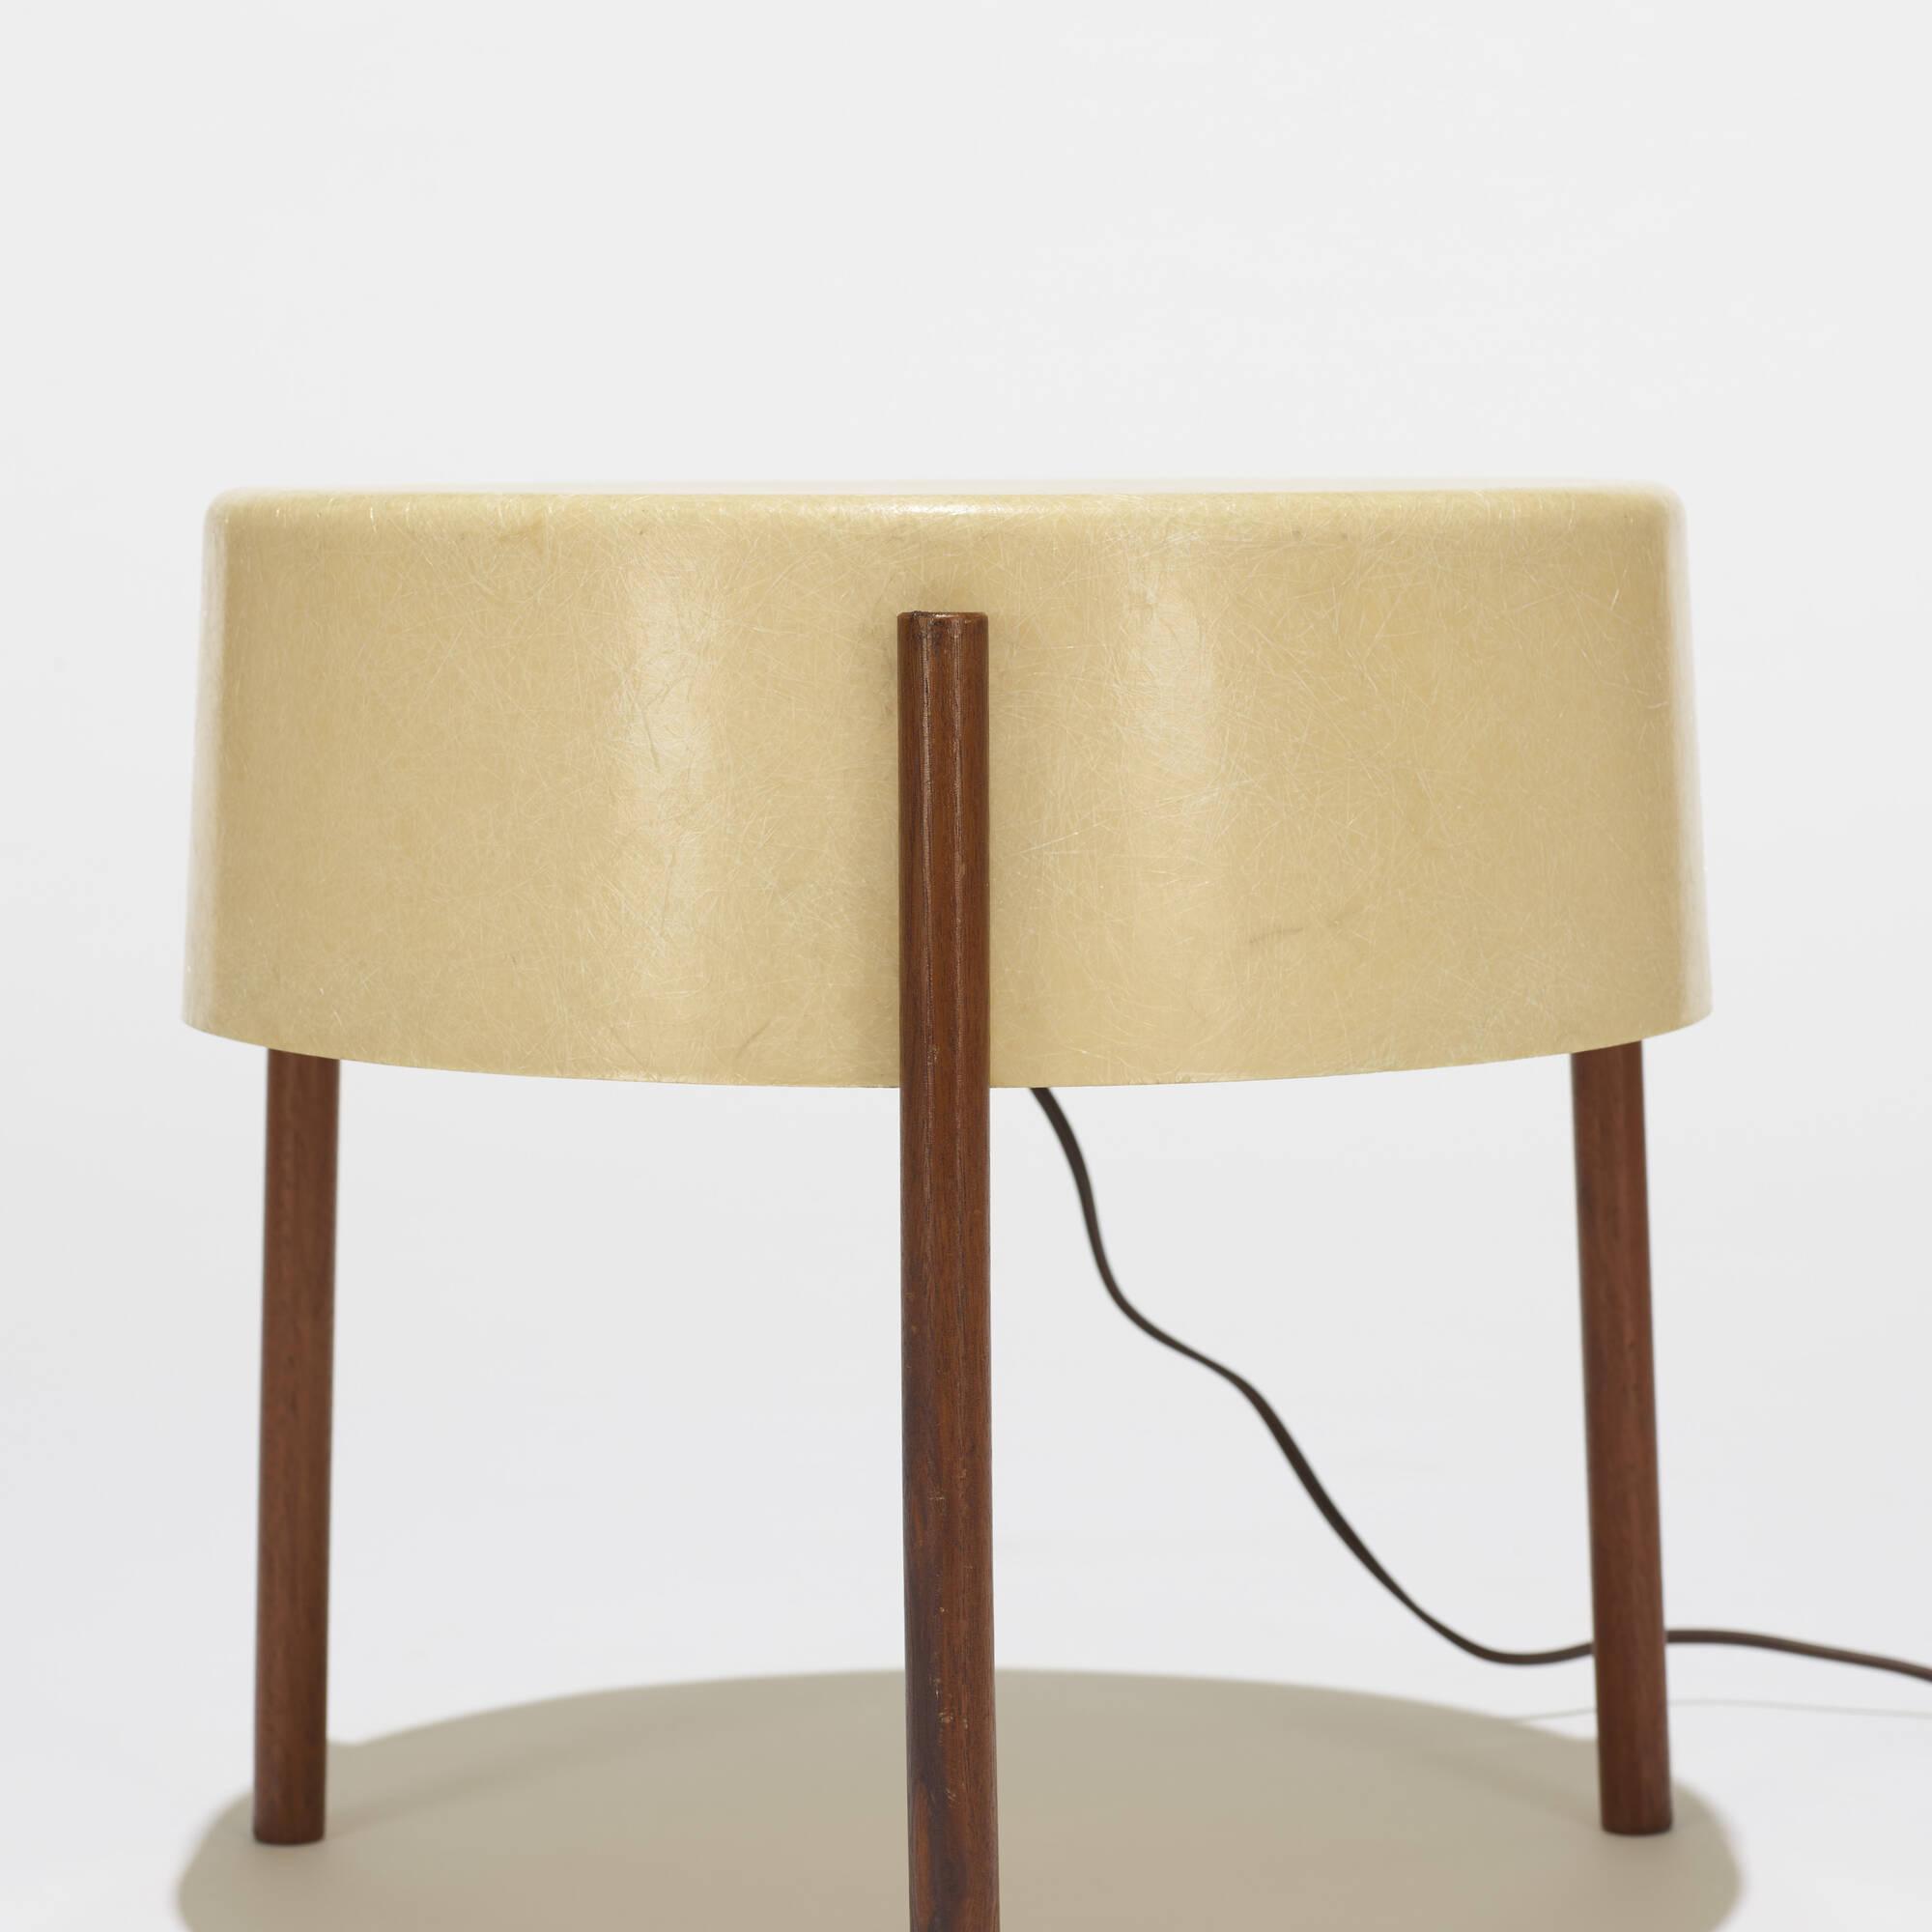 144: Bill Lam / Molded Fiberglass Light-Table, model LL-130 (2 of 2)